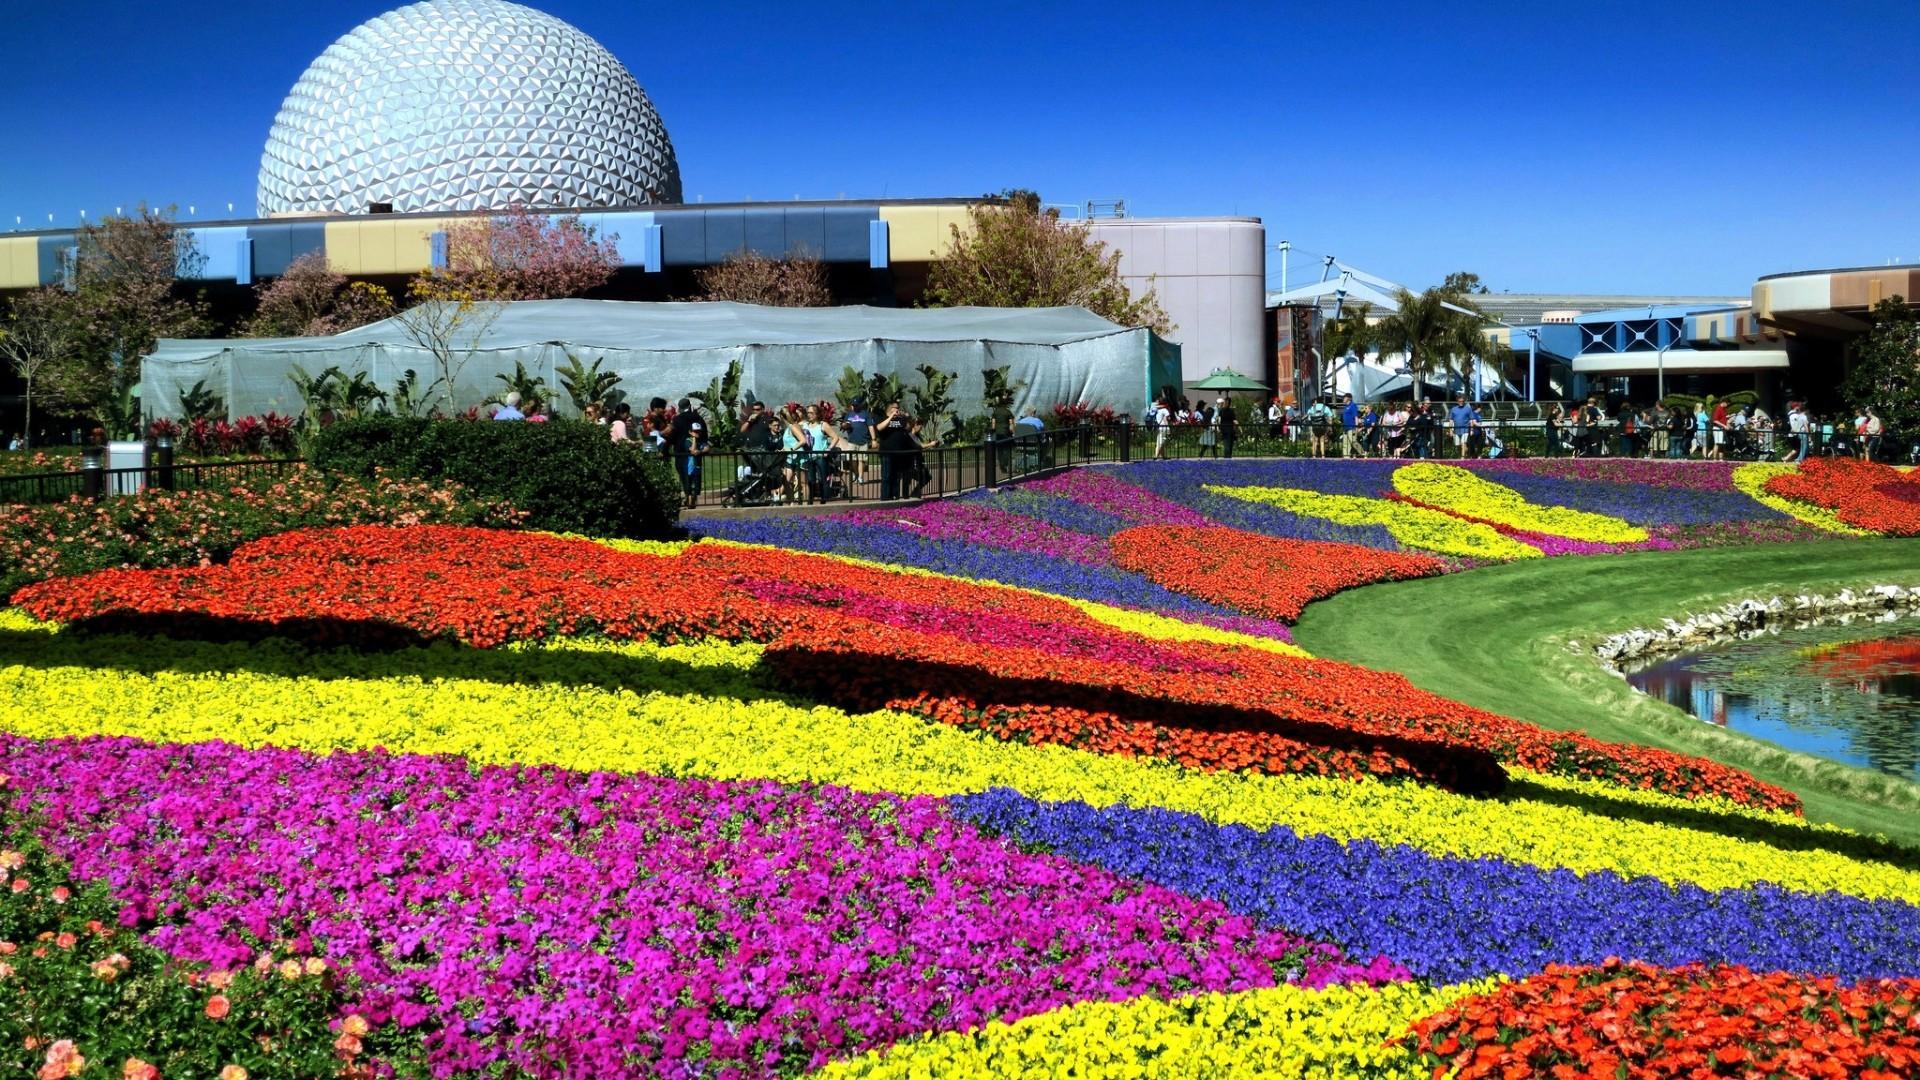 Sneak peek at 25th epcot international flower garden - Epcot flower and garden concerts ...